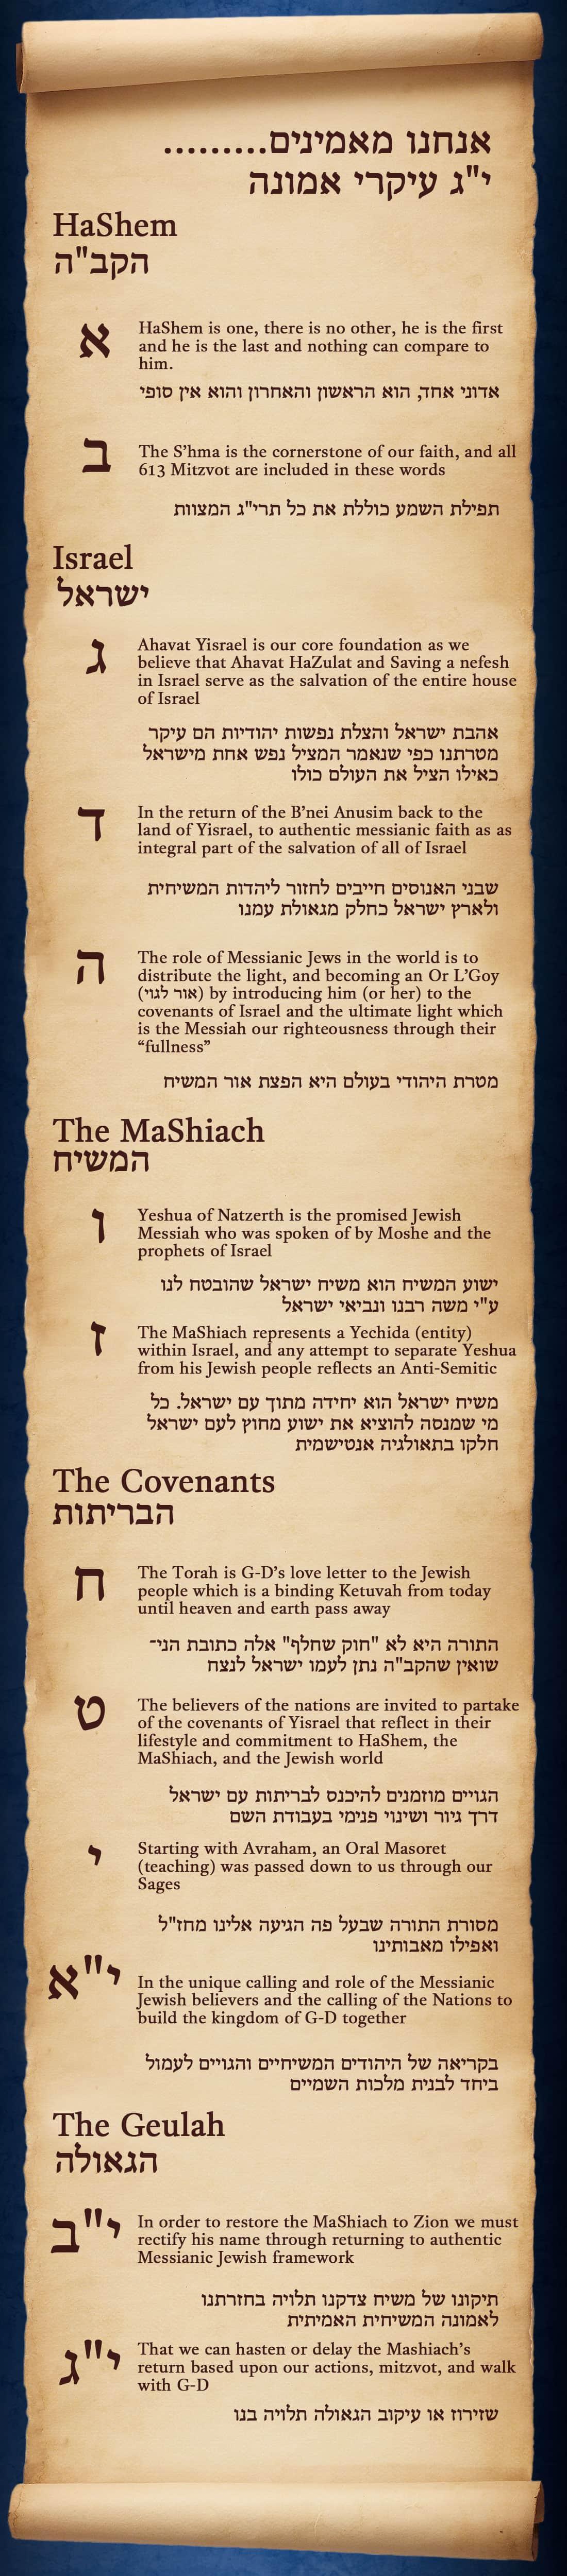 img_shuvu_principles_of_faith_corrected